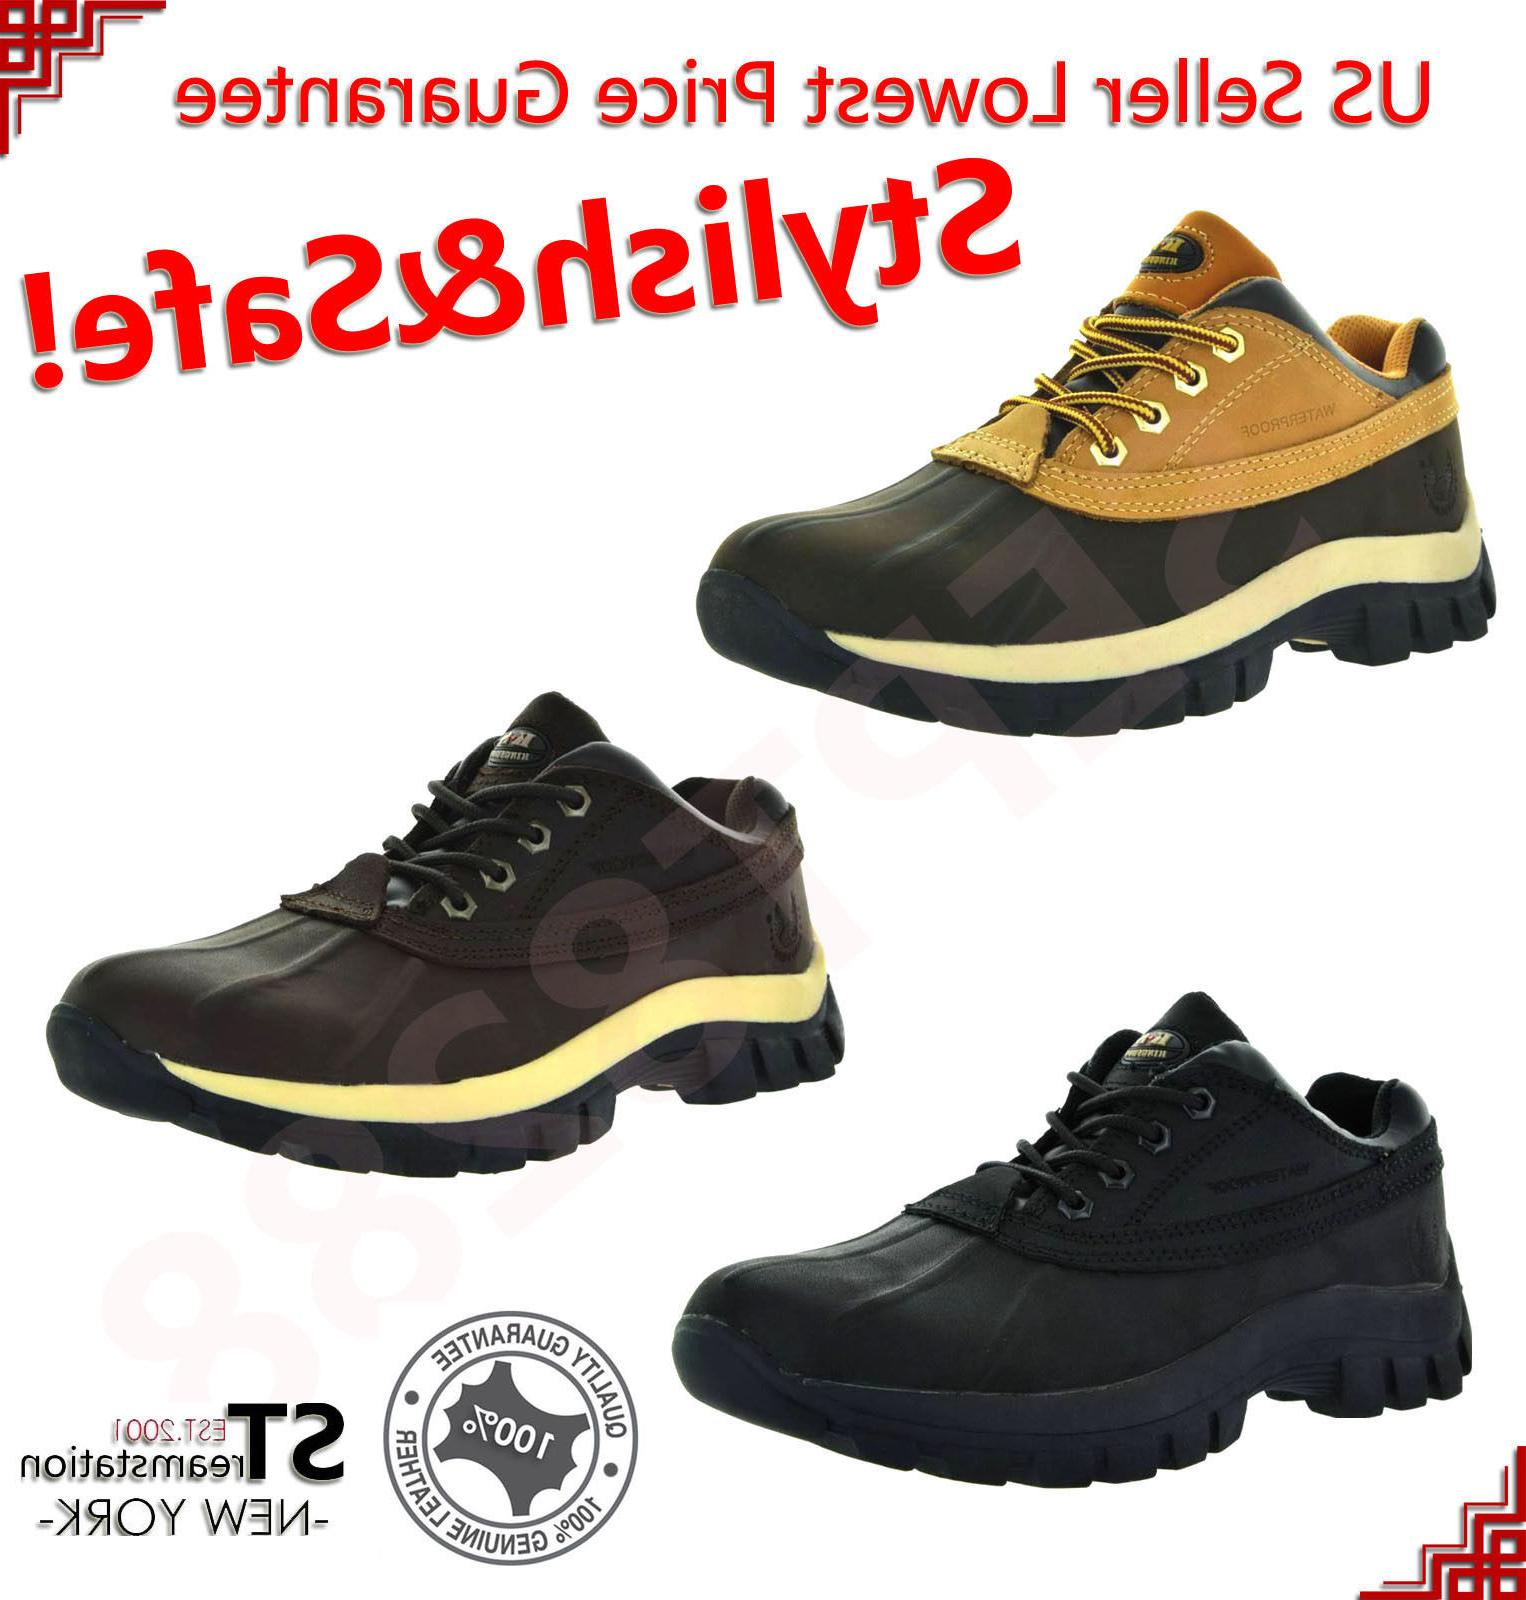 mens work boots 4 short winter snow